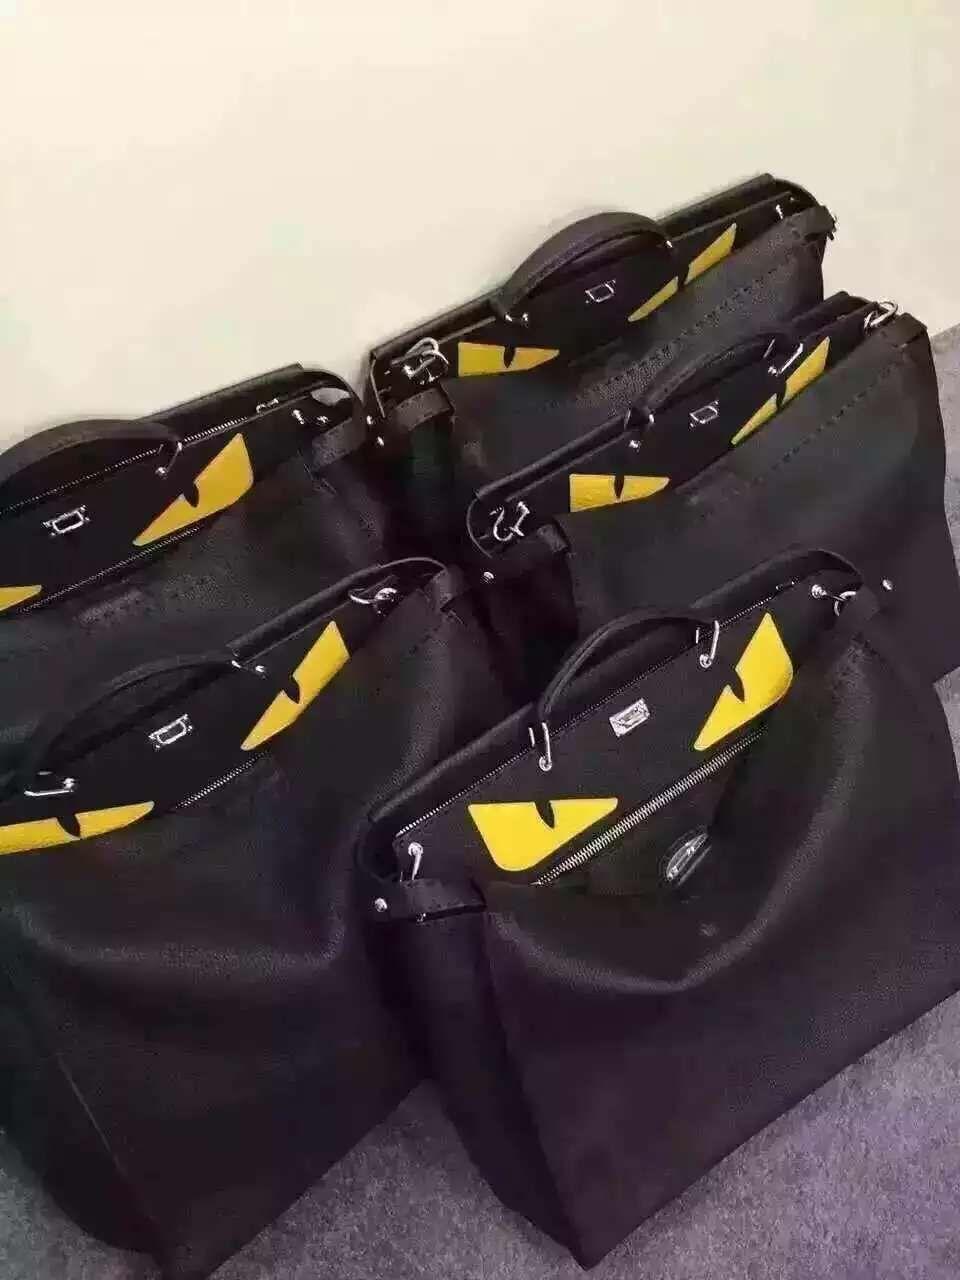 Fendi bag id forsaleayybags buy fendi bags online